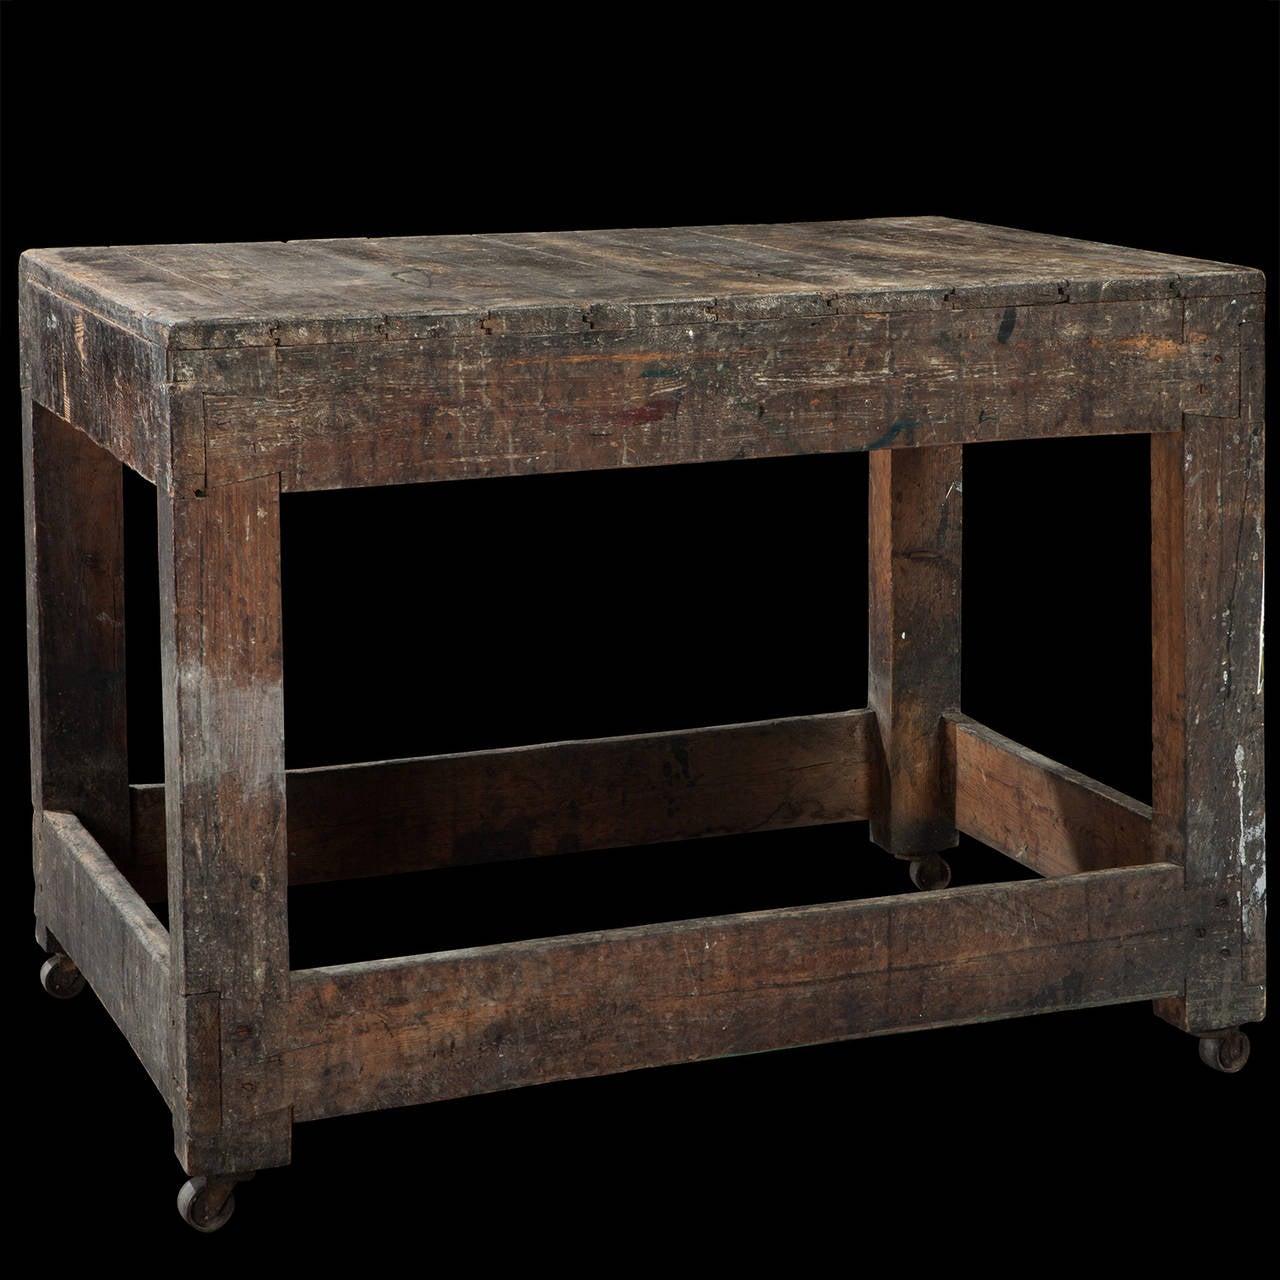 Primitive Side Table at 1stdibs : PRIM26435l from 1stdibs.com size 1280 x 1280 jpeg 163kB